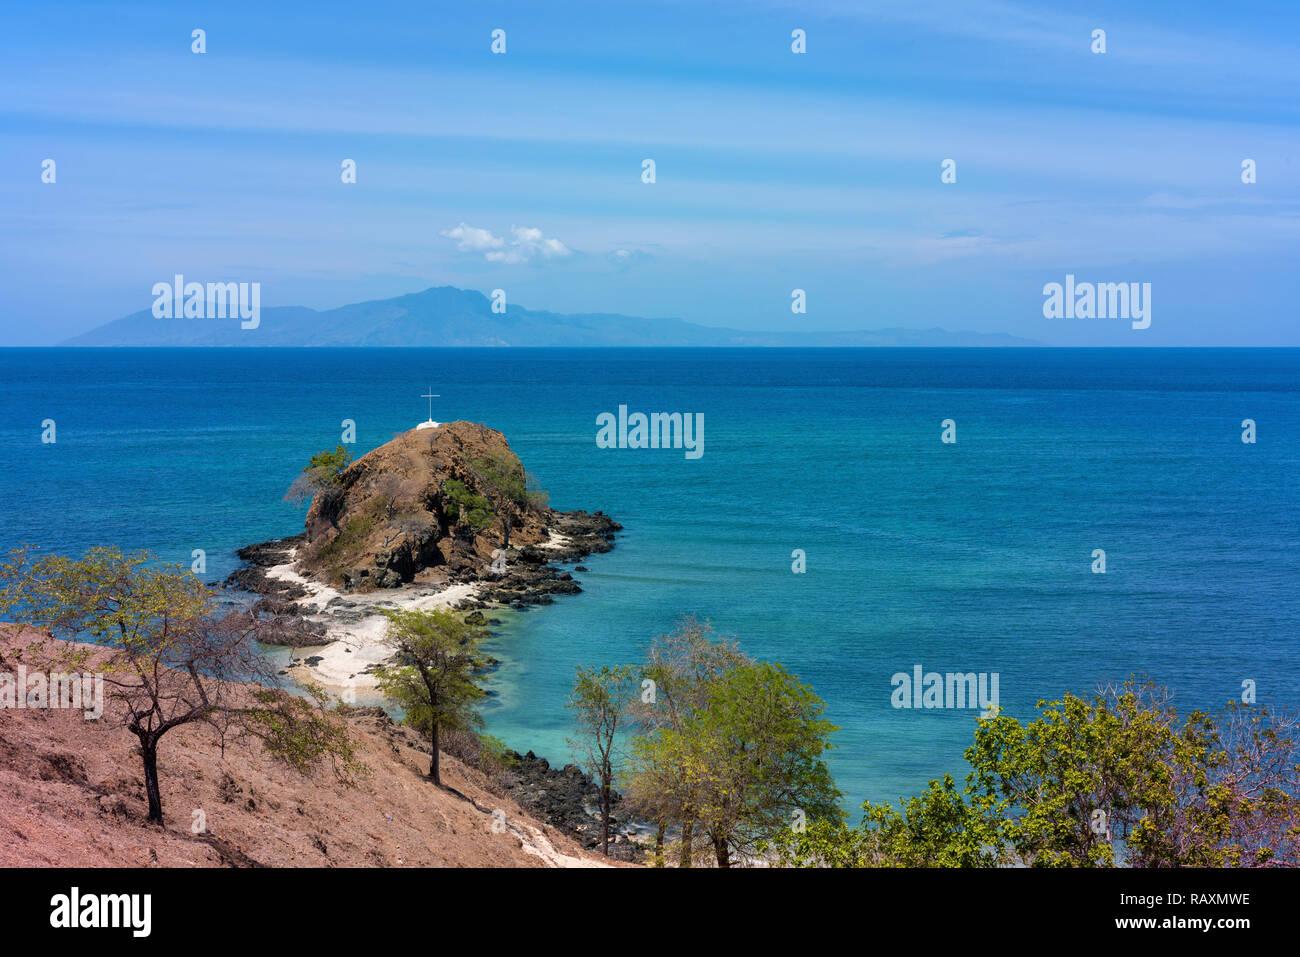 Looking across the Banda Sea toward Atauro Island from the north coast of Timor Leste. Stock Photo